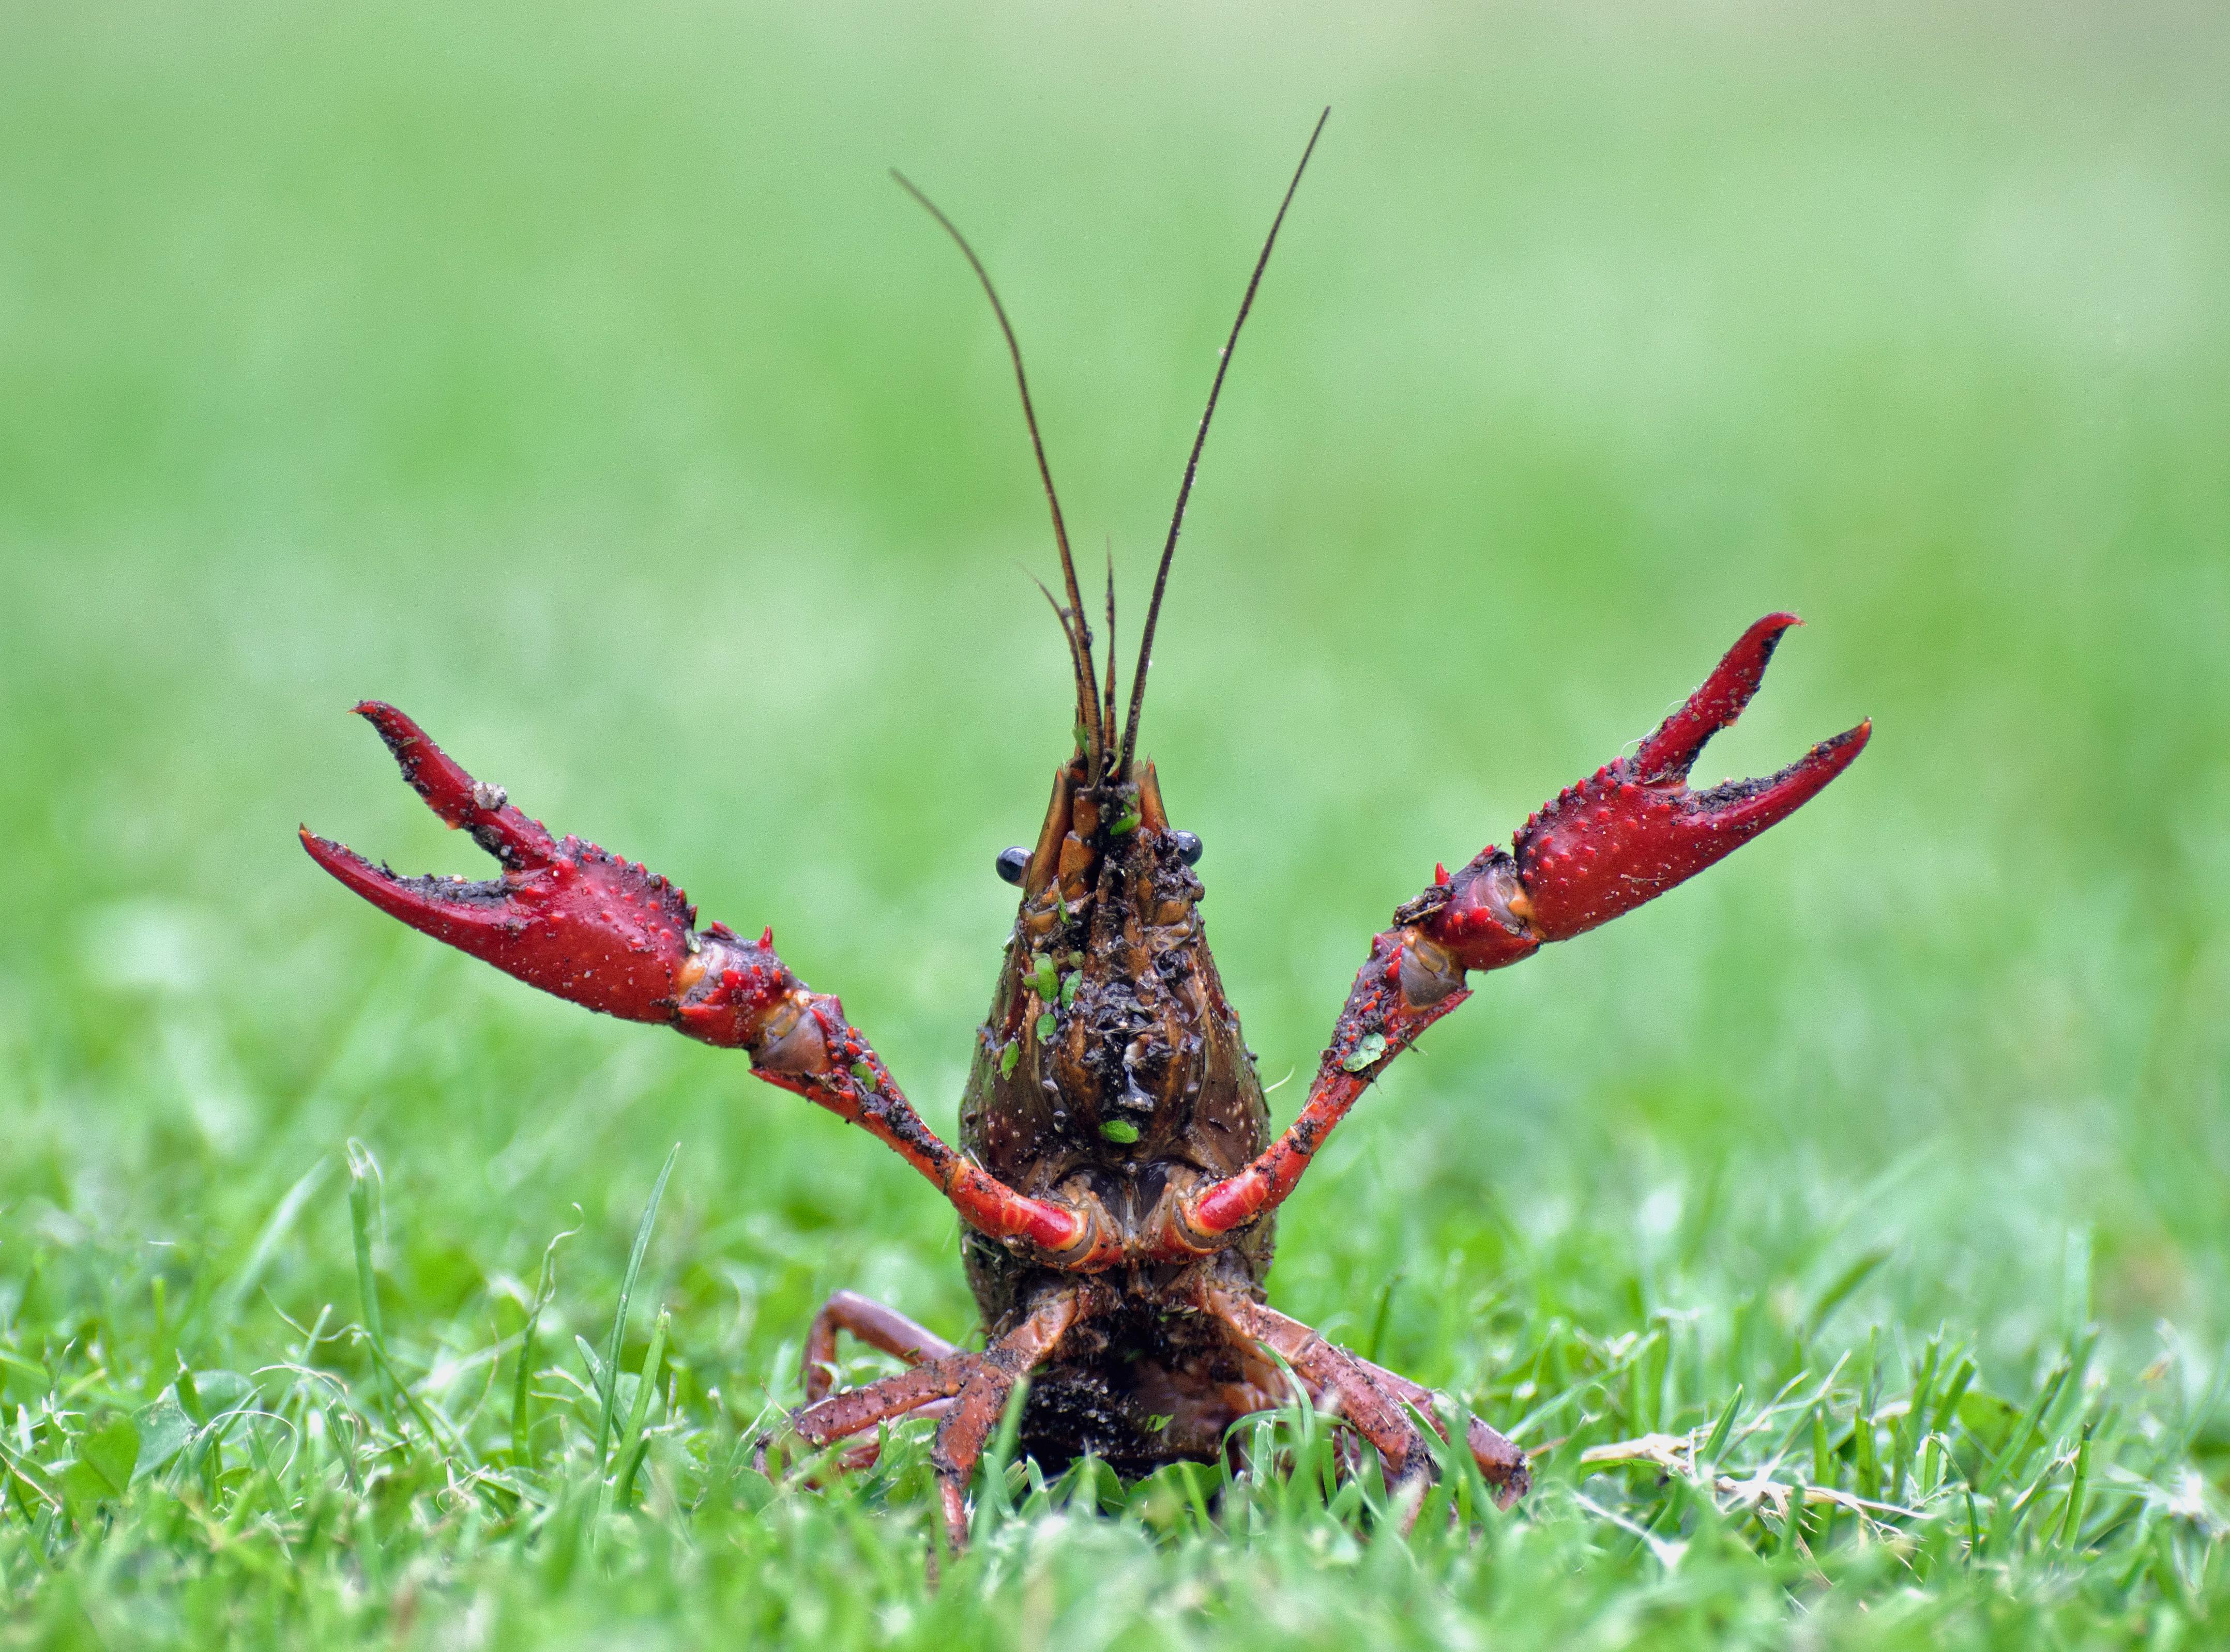 De rode monstertjes die alles opeten wat ze tegenkomen | column Geeke Remmelts